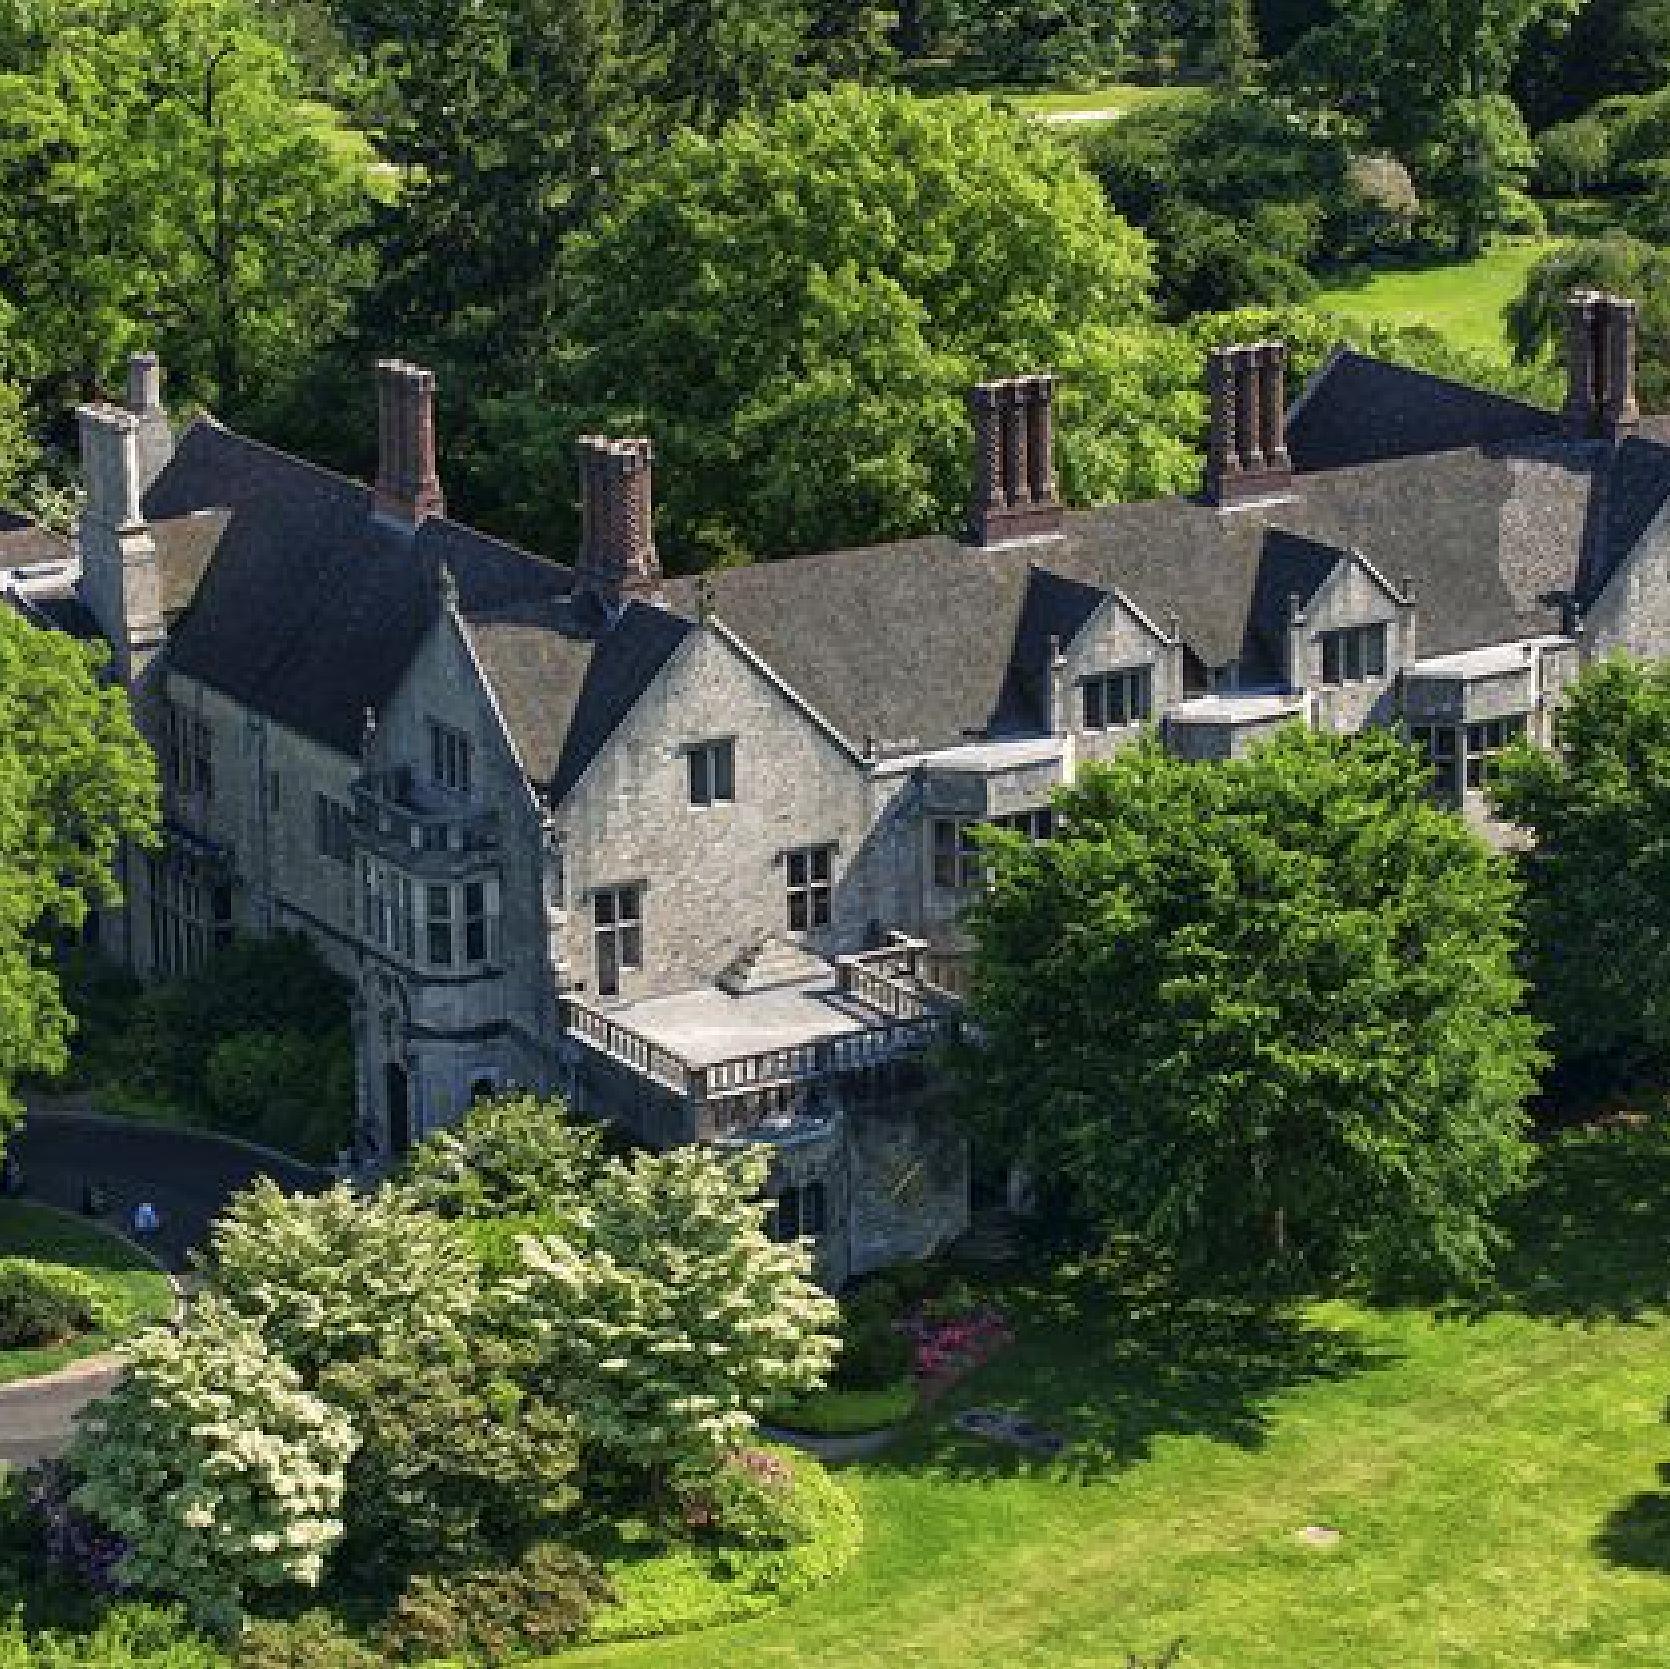 Сады особняка Coe Hall - Тур по территории